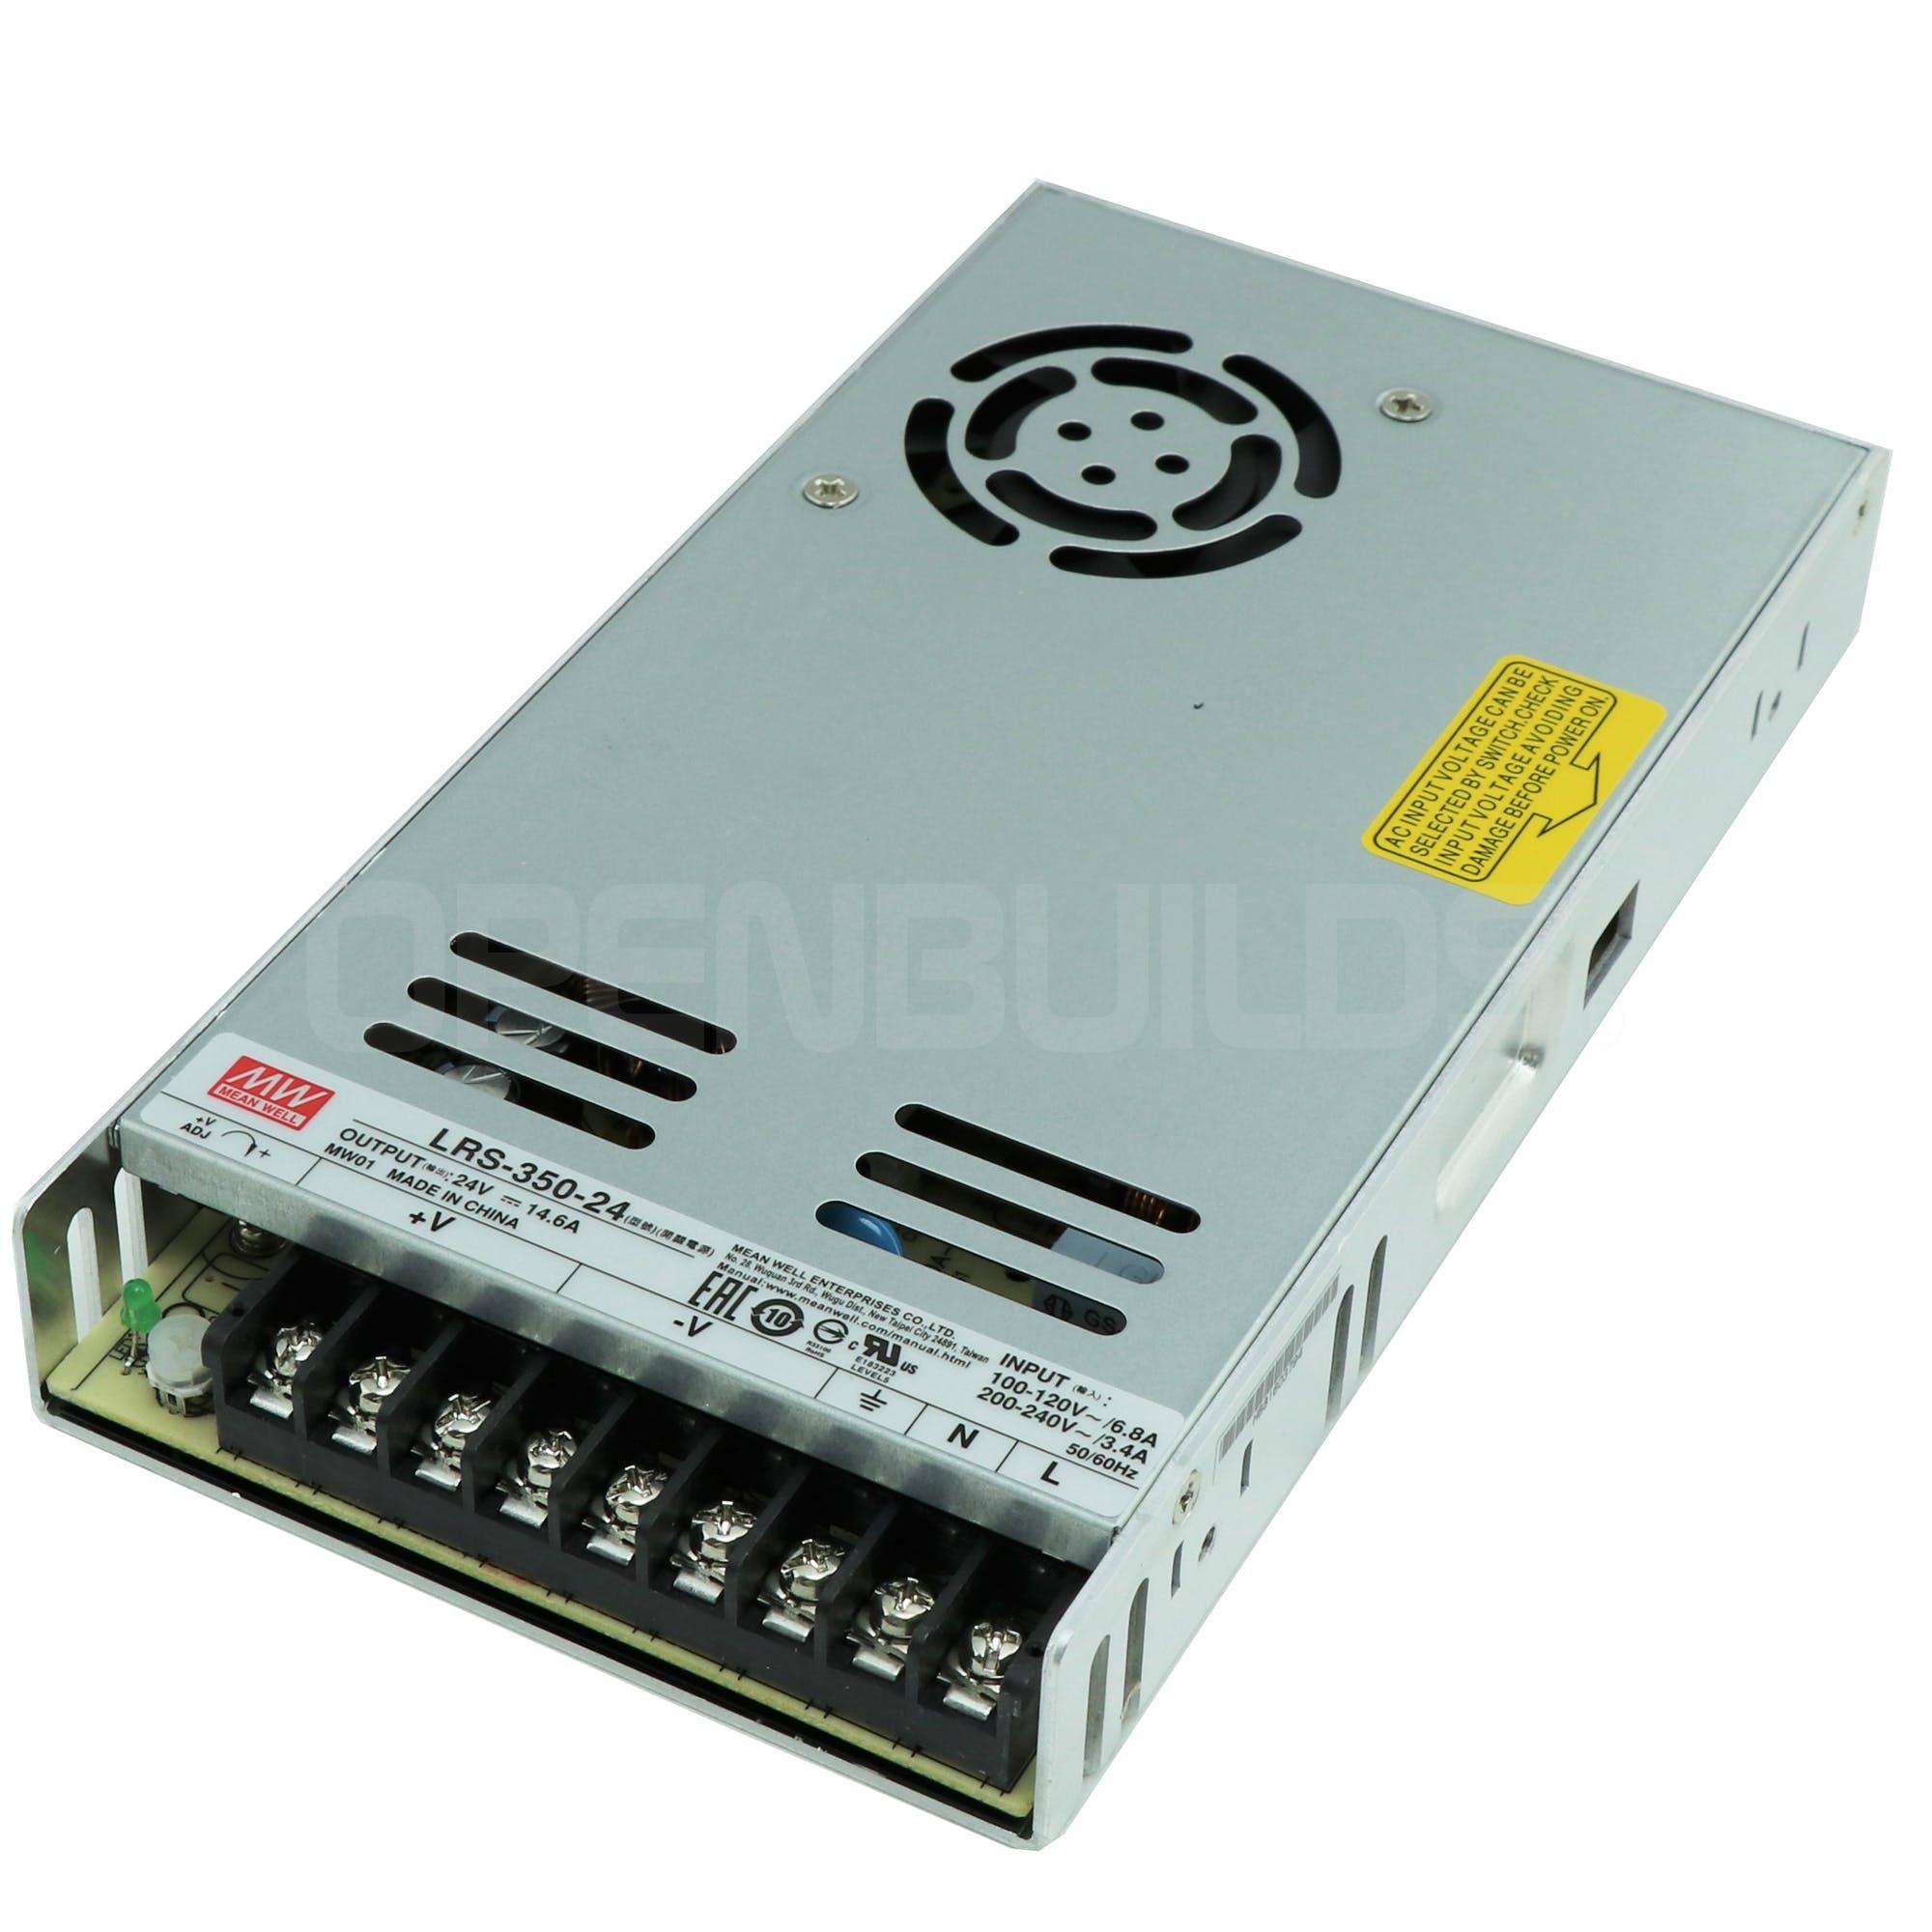 24v power supply aqrbg7y5vc